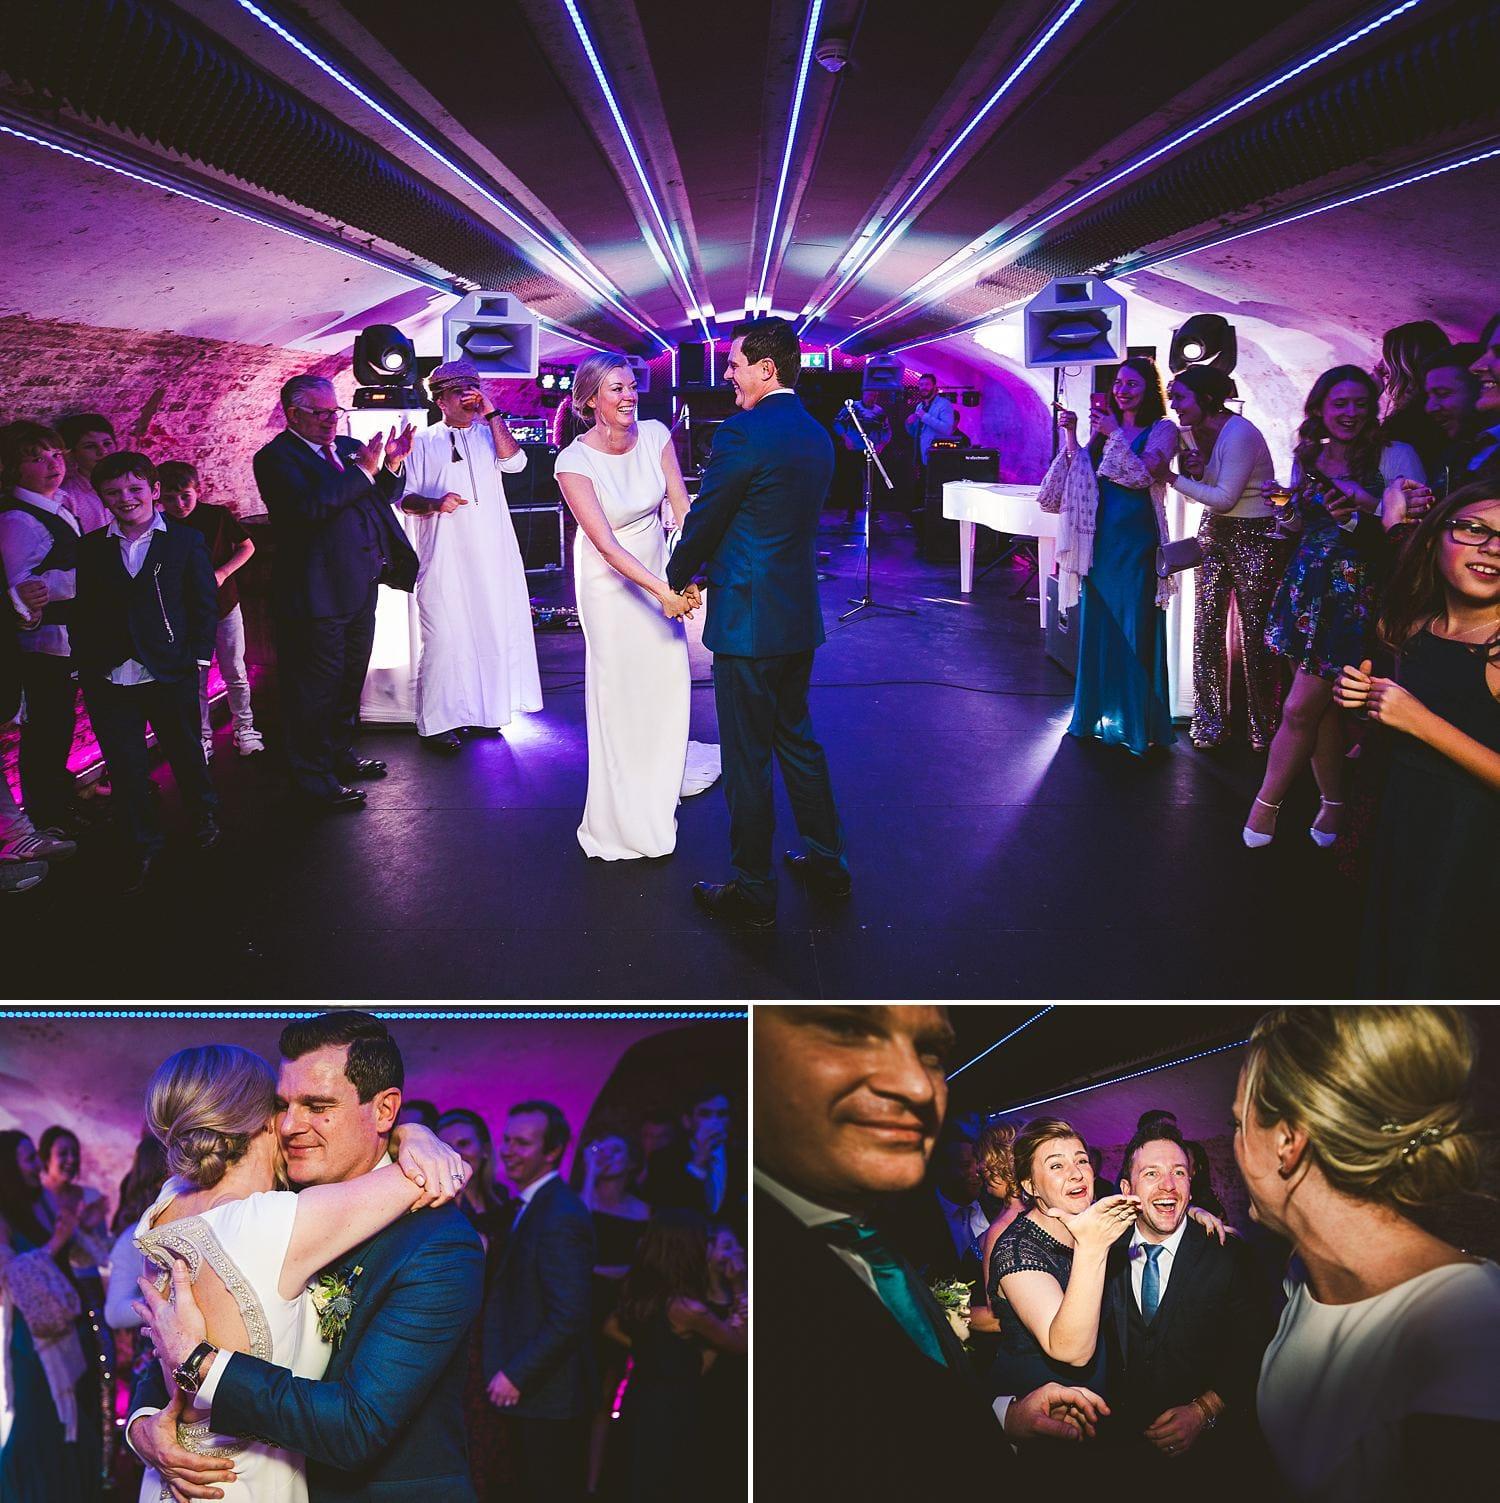 St Giles House wedding nightclub